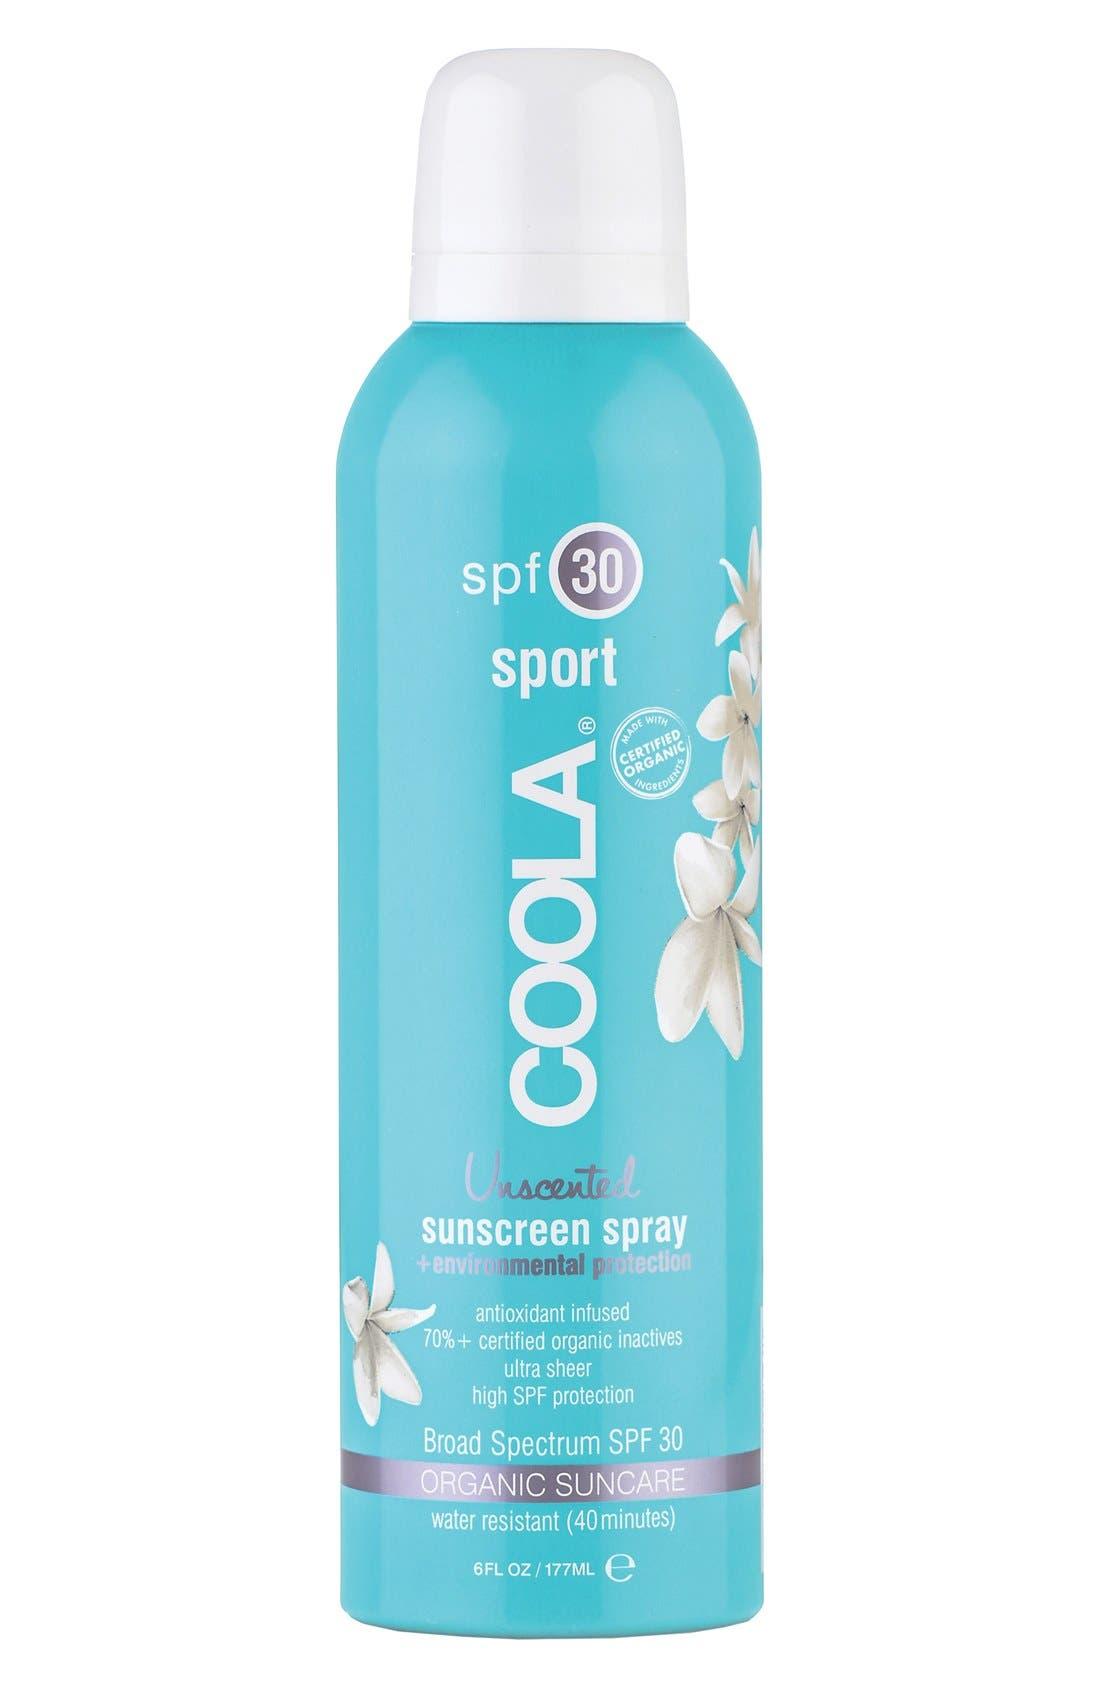 Coola Suncare Sport Sunscreen Spray Broad Spectrum Spf 30, oz